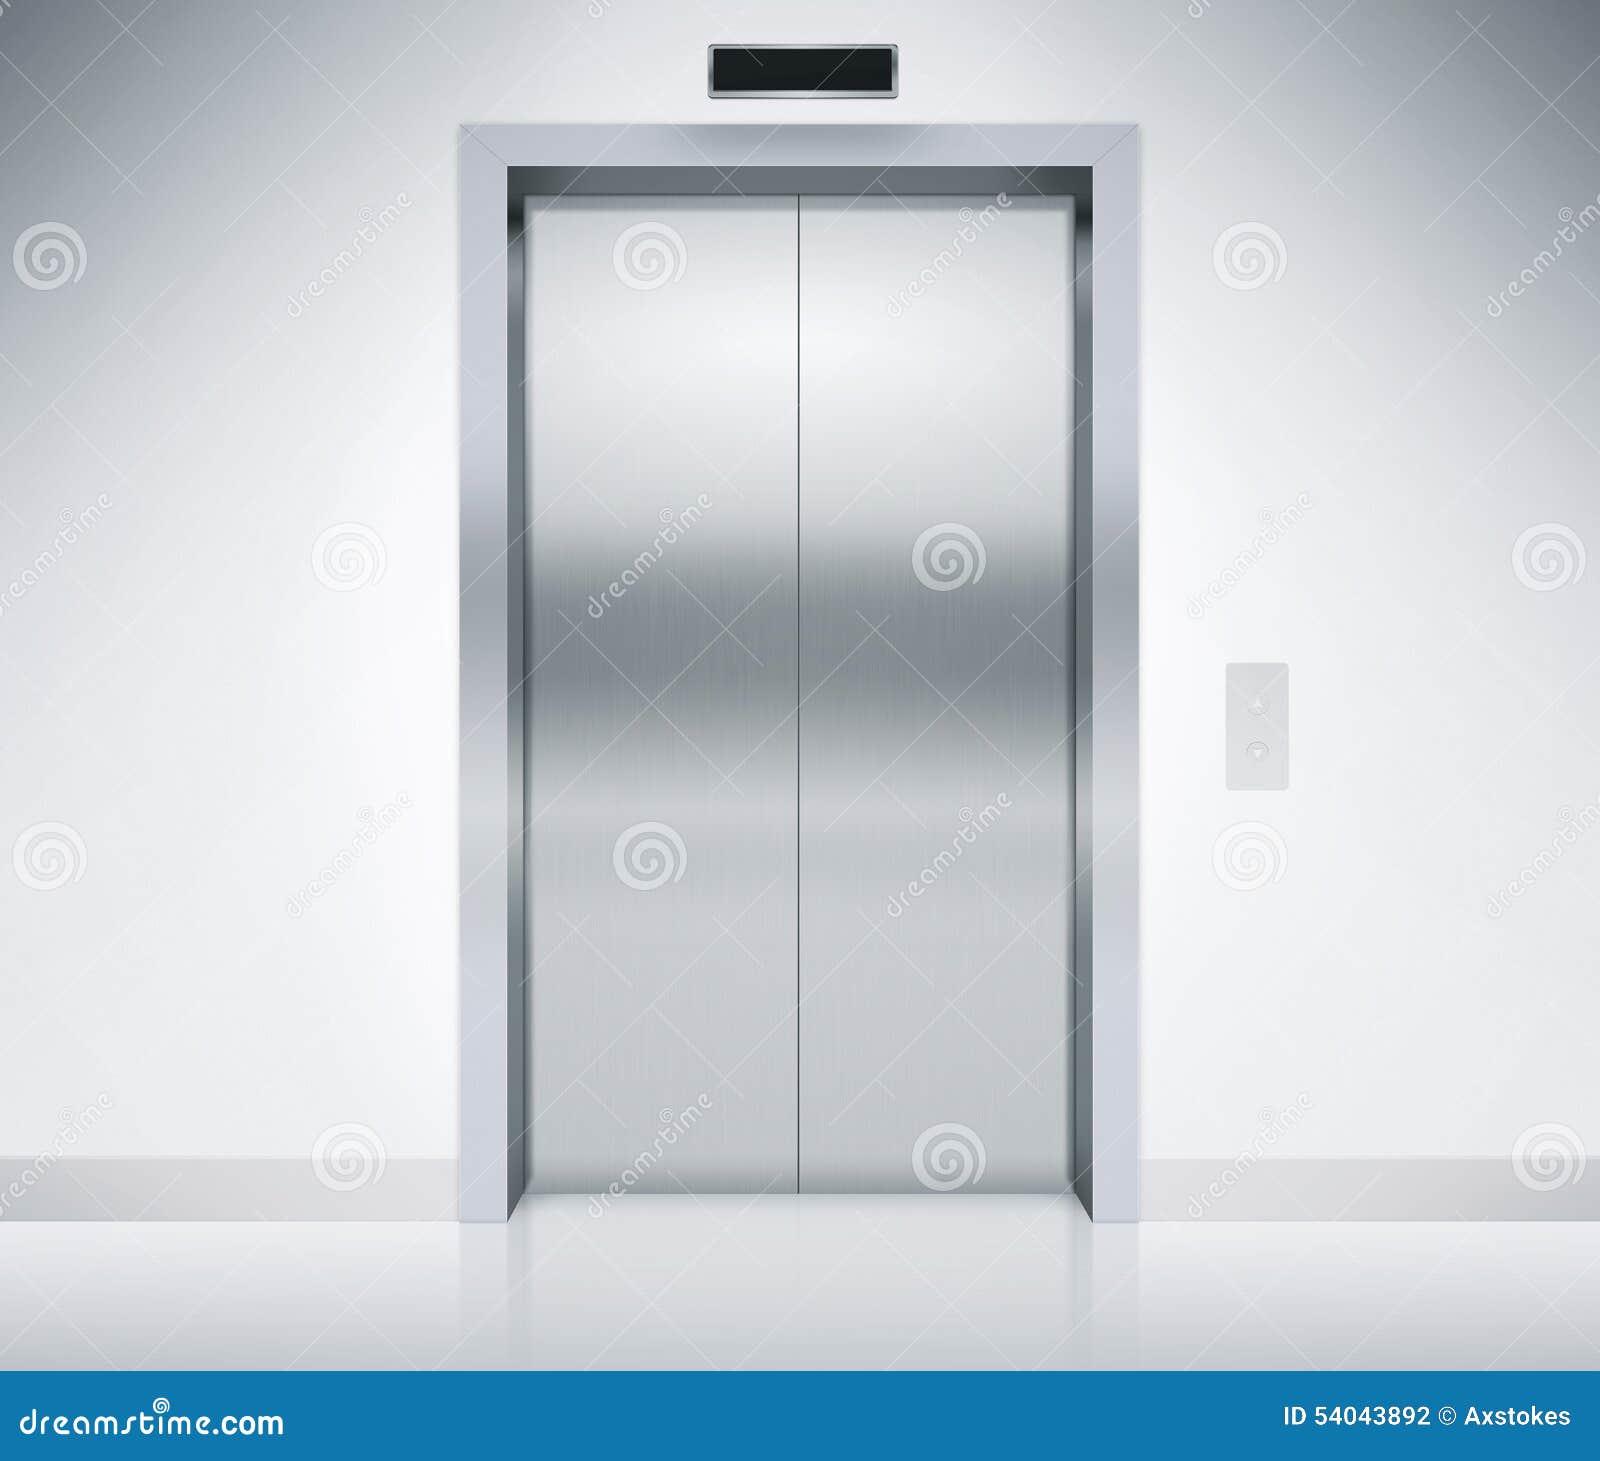 Elevator Doors Closed Stock Illustration Image 54043892